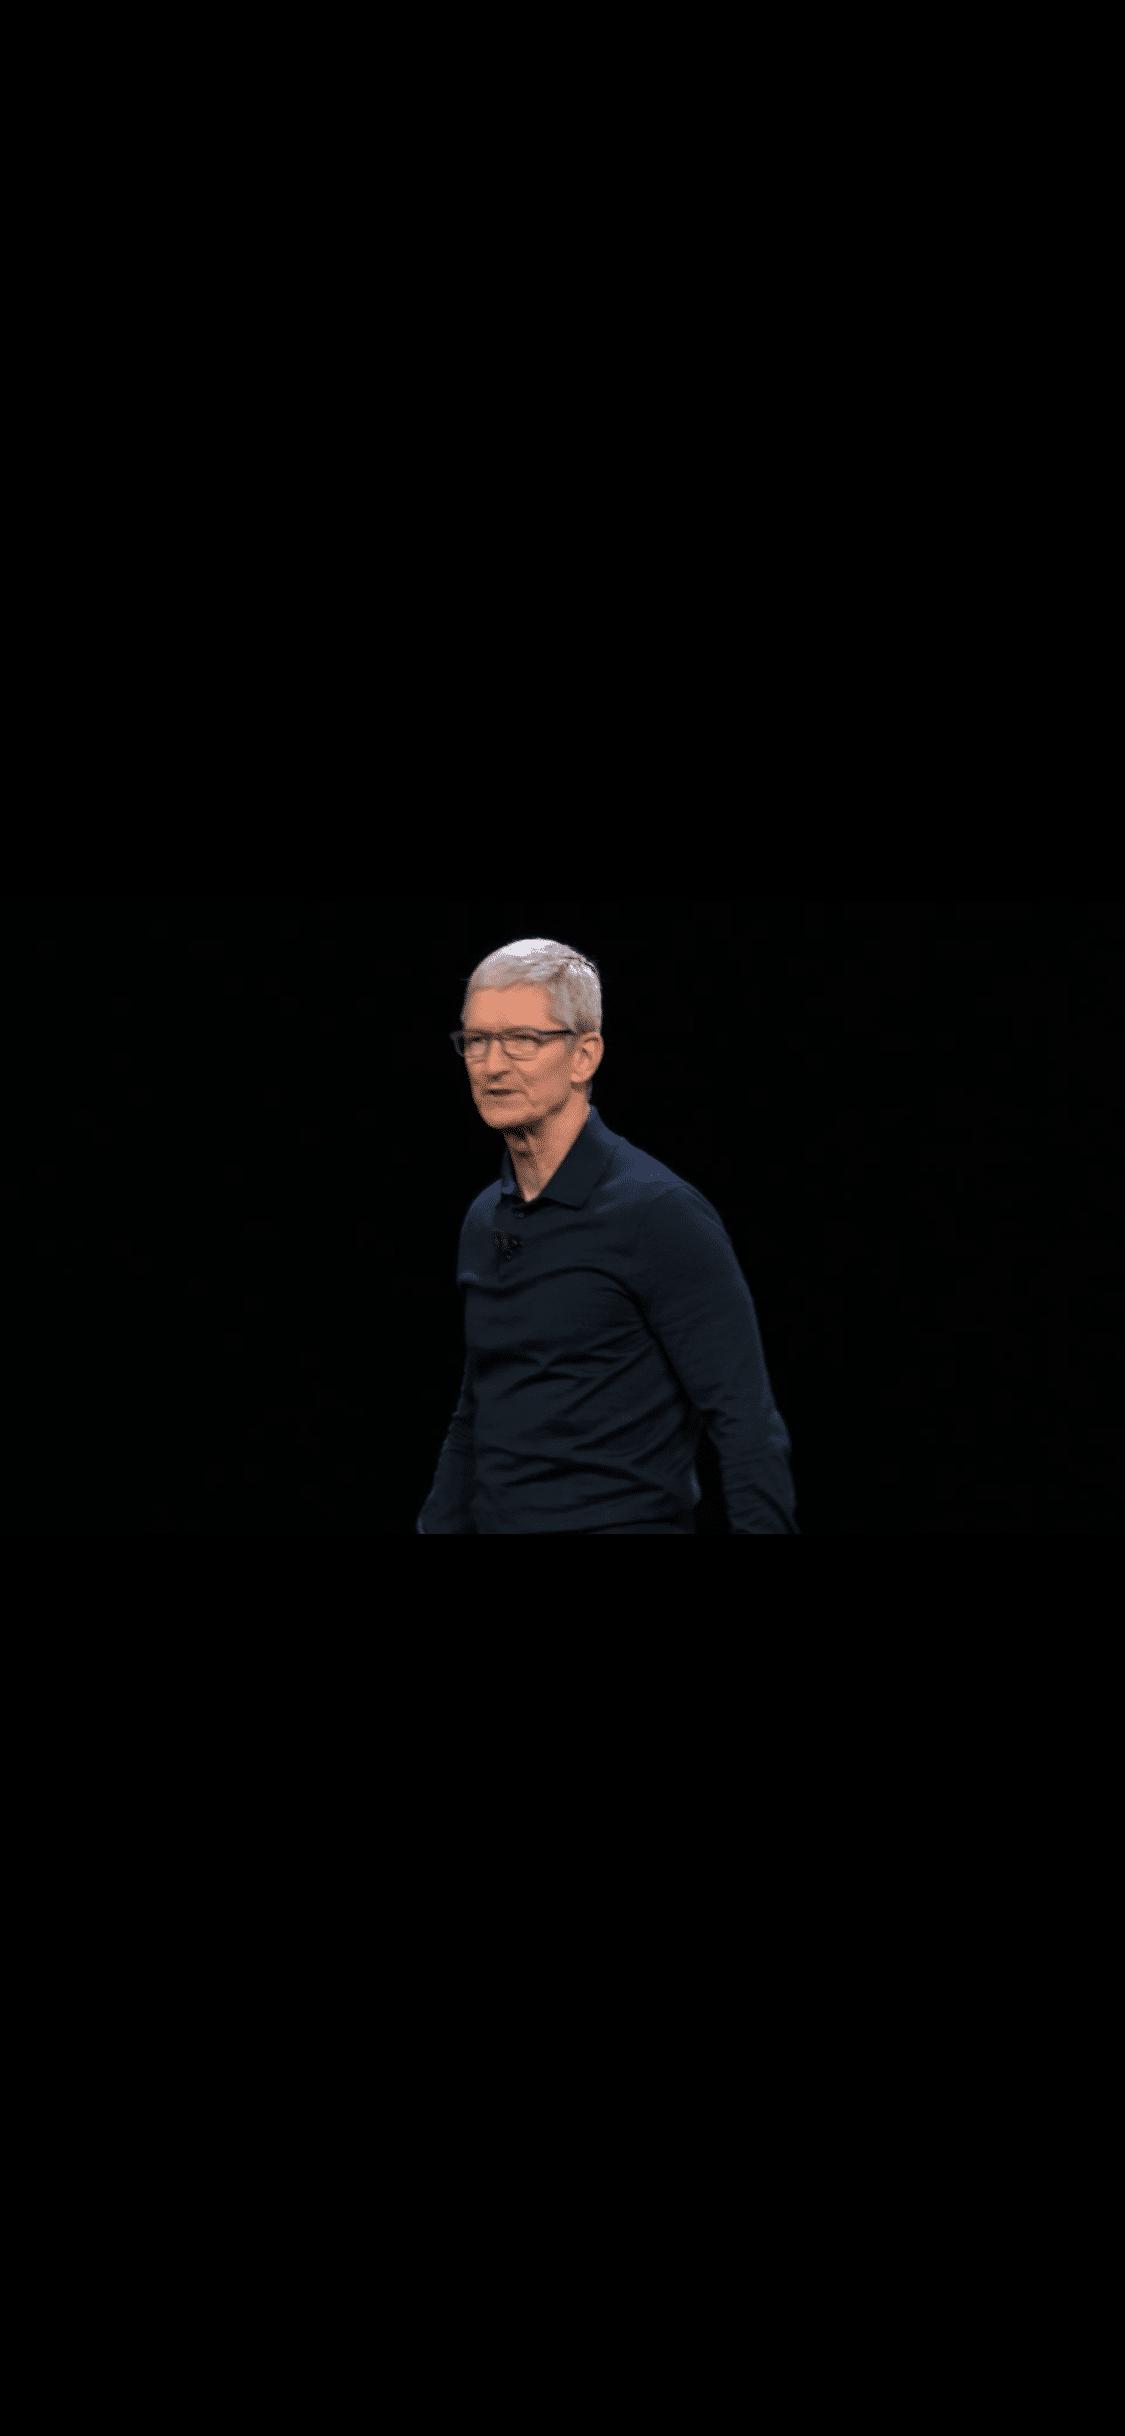 WWDC 2018 keynote video